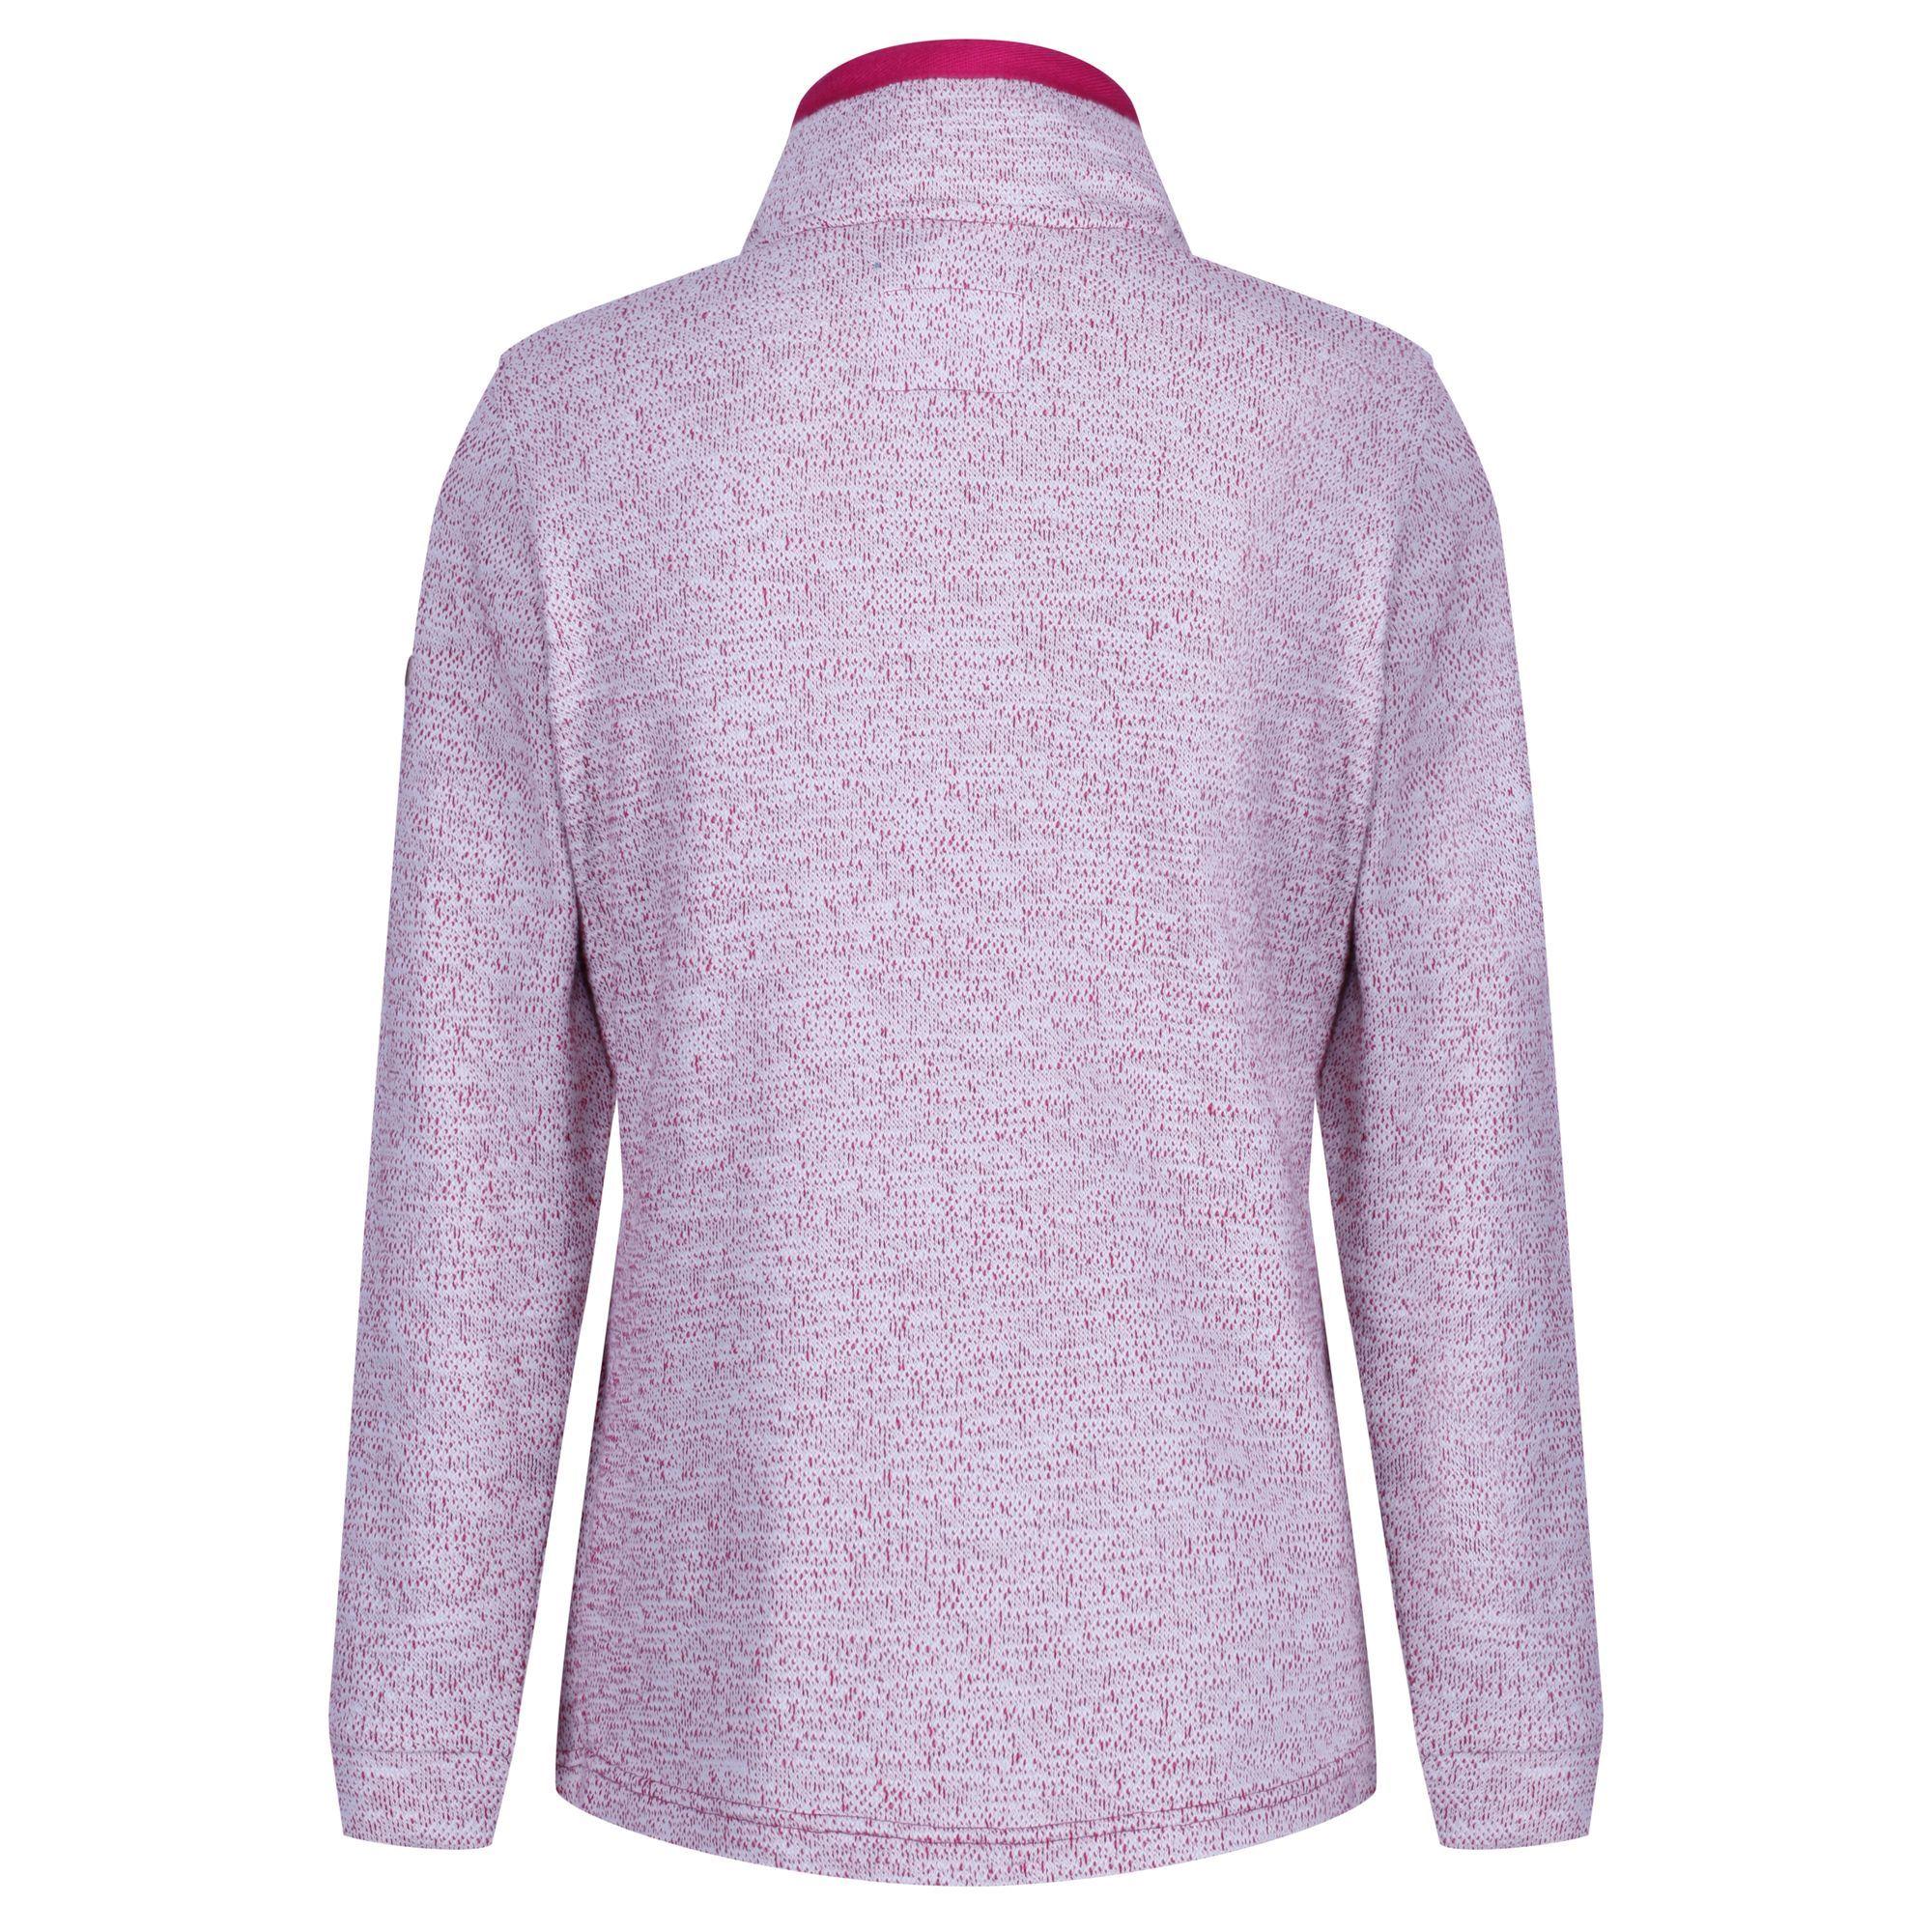 Regatta-Odetta-Womens-Warm-Curved-Full-Zip-Fleece-Jacket-RRP-50 thumbnail 21